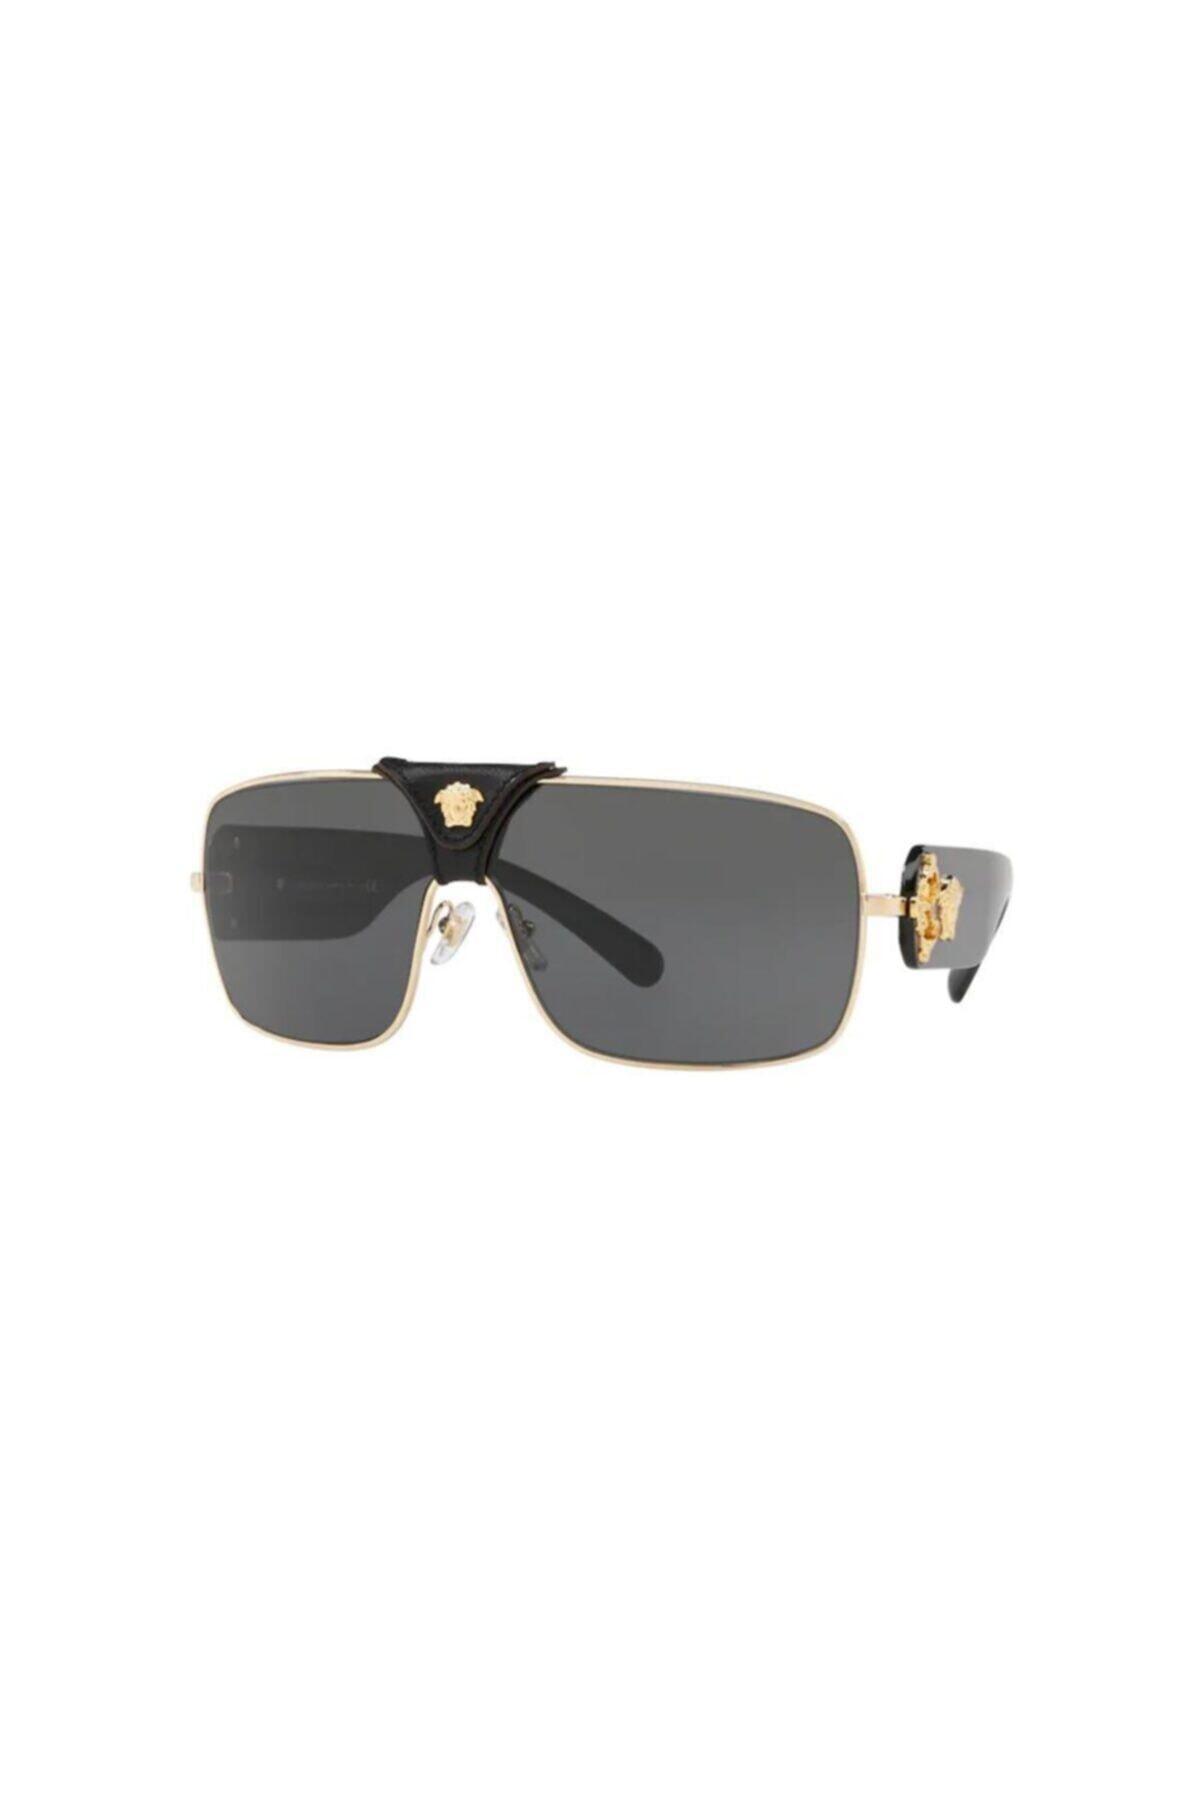 سفارش عینک دودی اسپرت ارزان برند ورساچ رنگ مشکی کد ty96546167